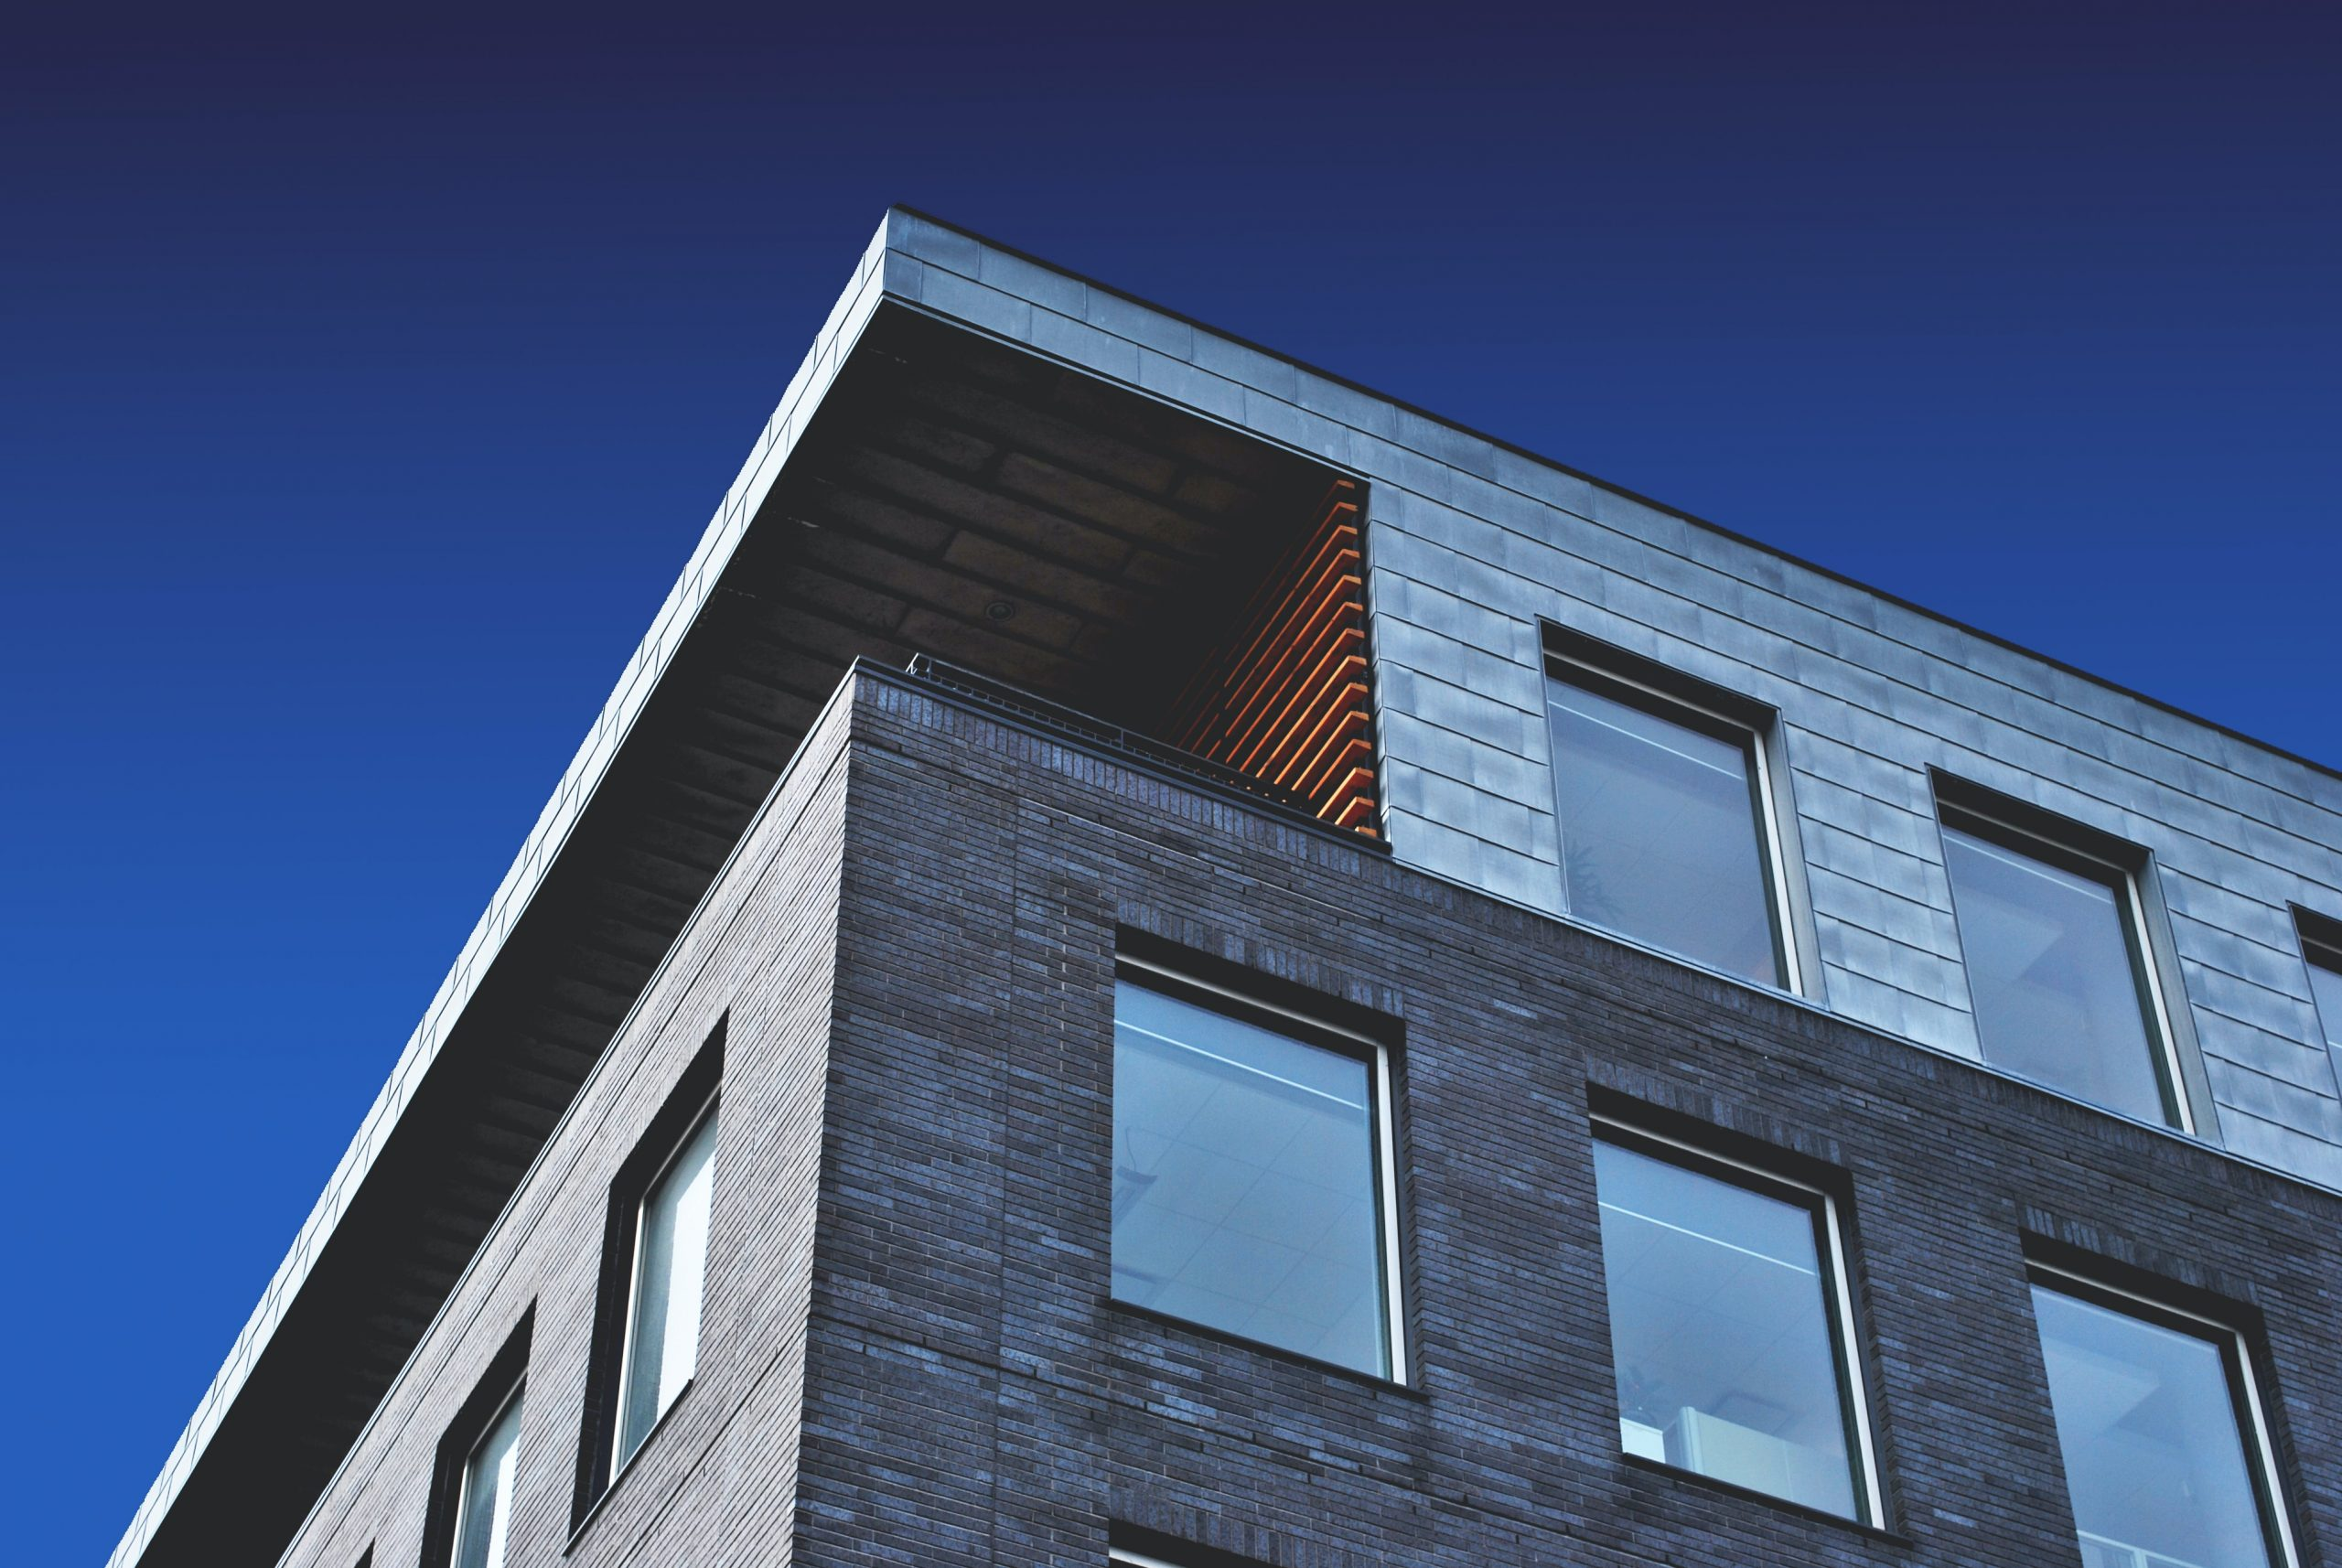 Commercial Building Windows